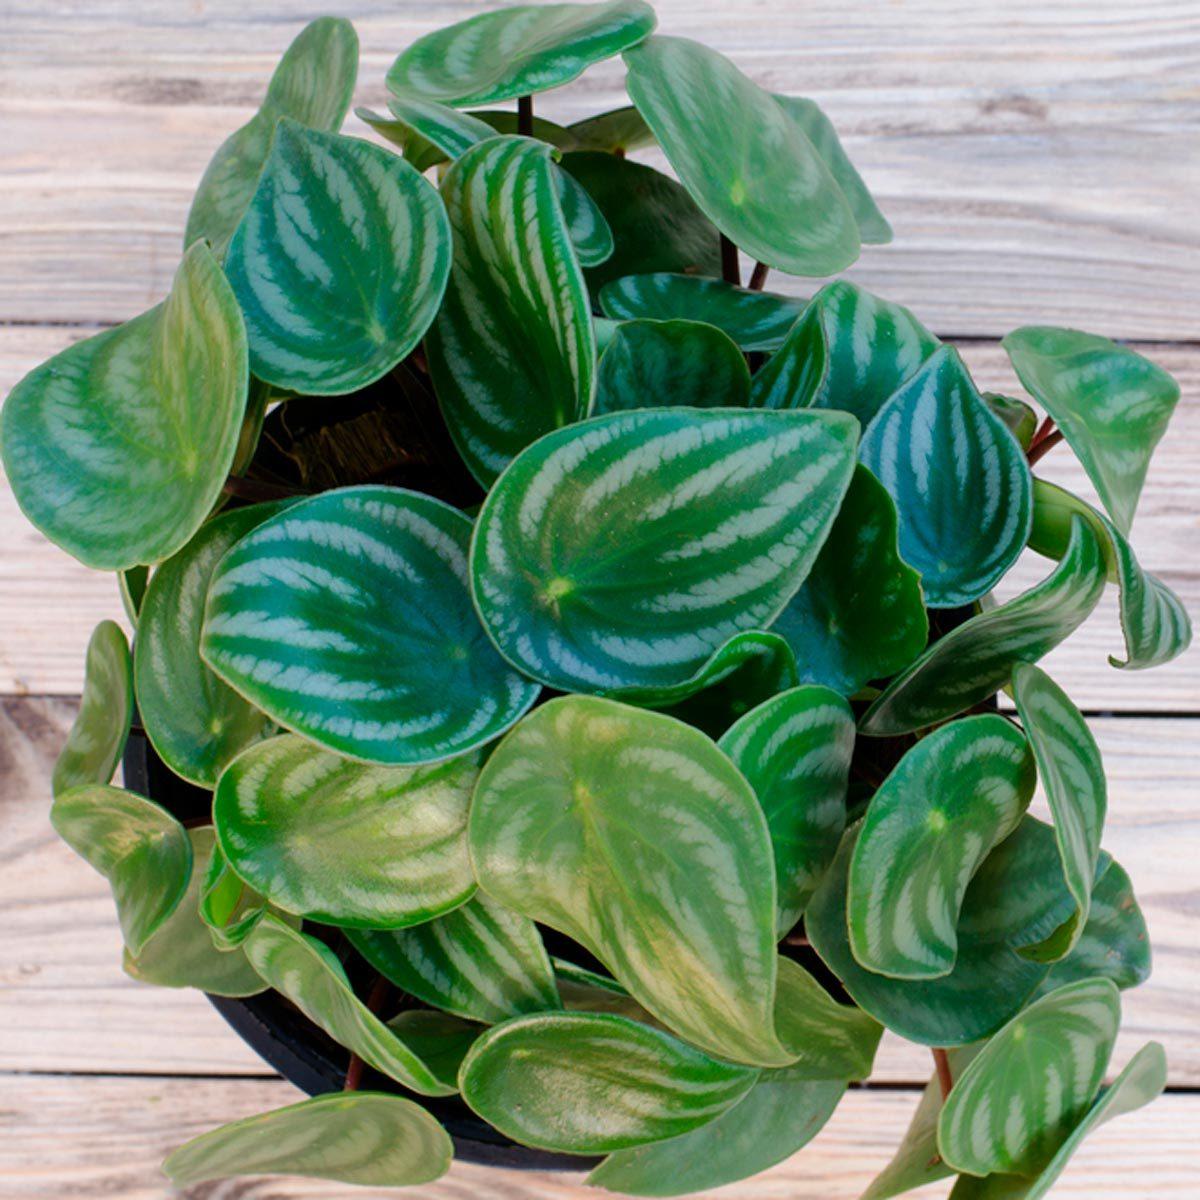 leaf of nontoxic houseplants